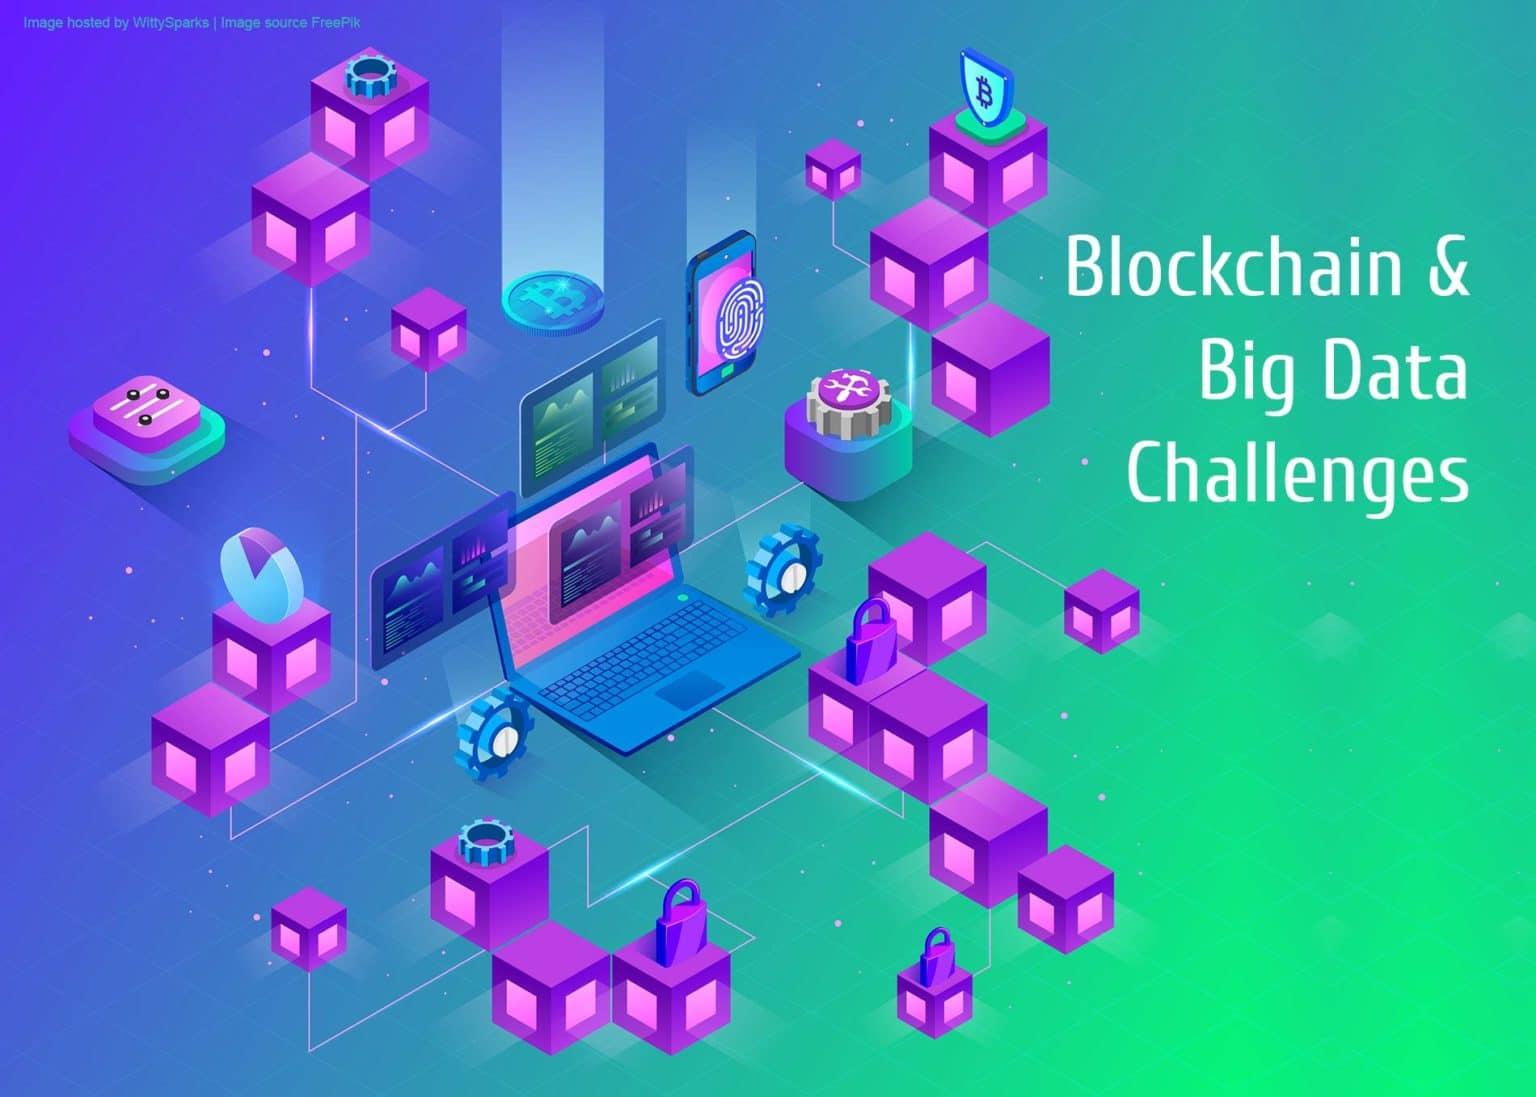 Blockchain and big data challenges